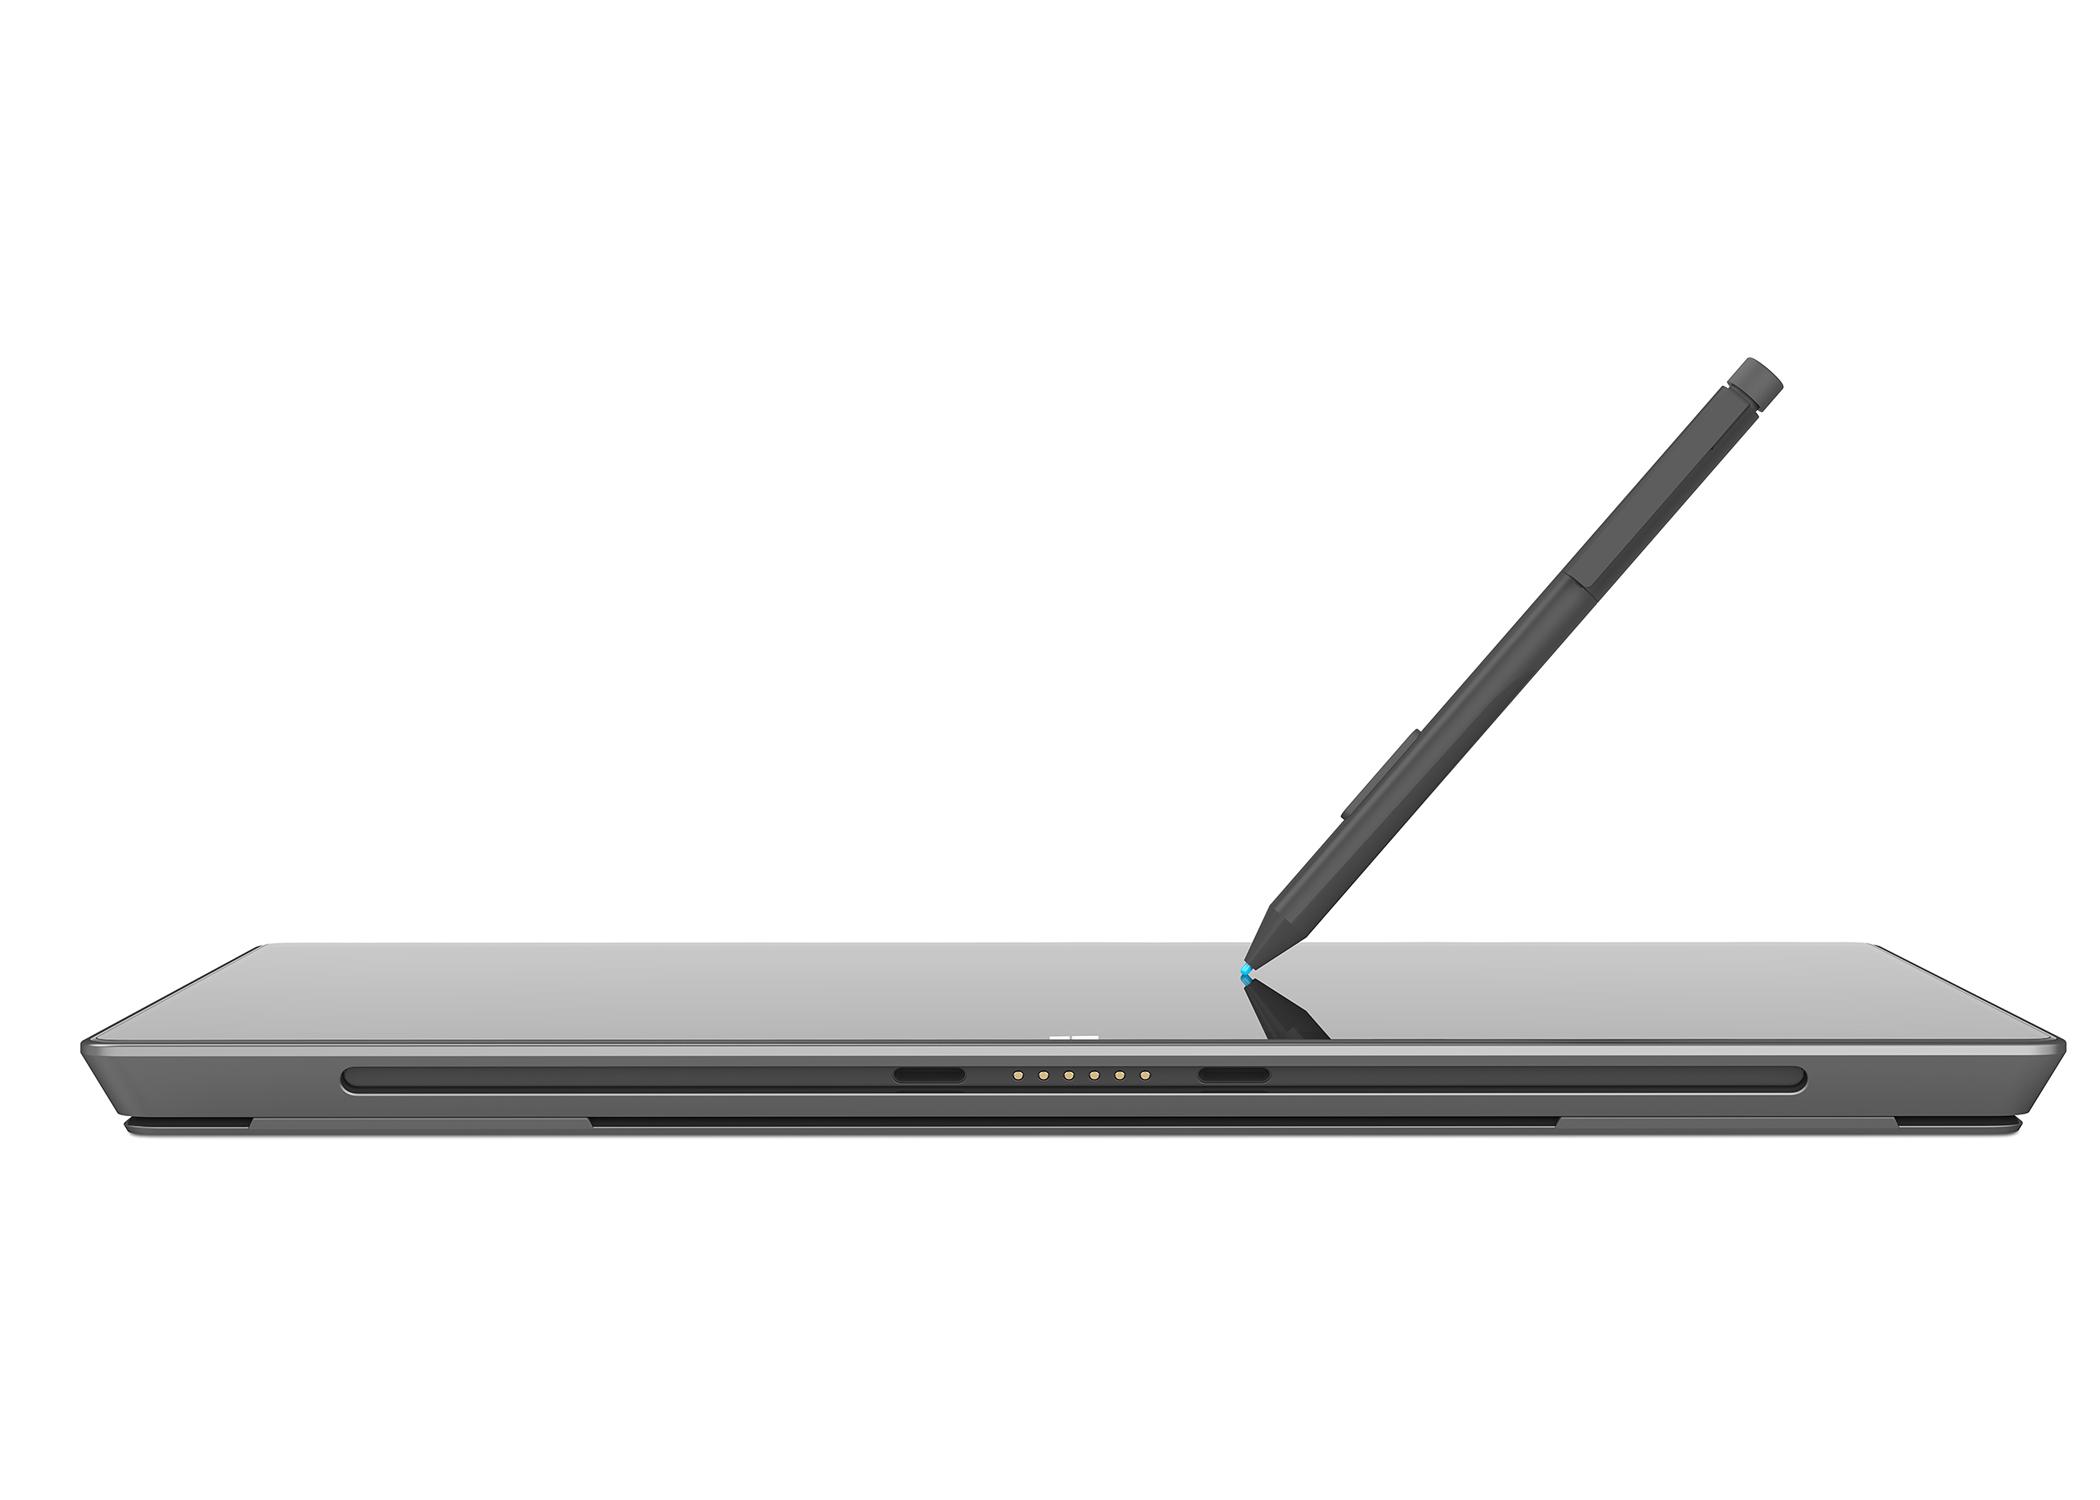 Microsoft-Tablet: Surface Pro mit nur 23 GByte freiem Speicher - Microsoft Surface Pro mit dem Stylus (Bild: Microsoft)